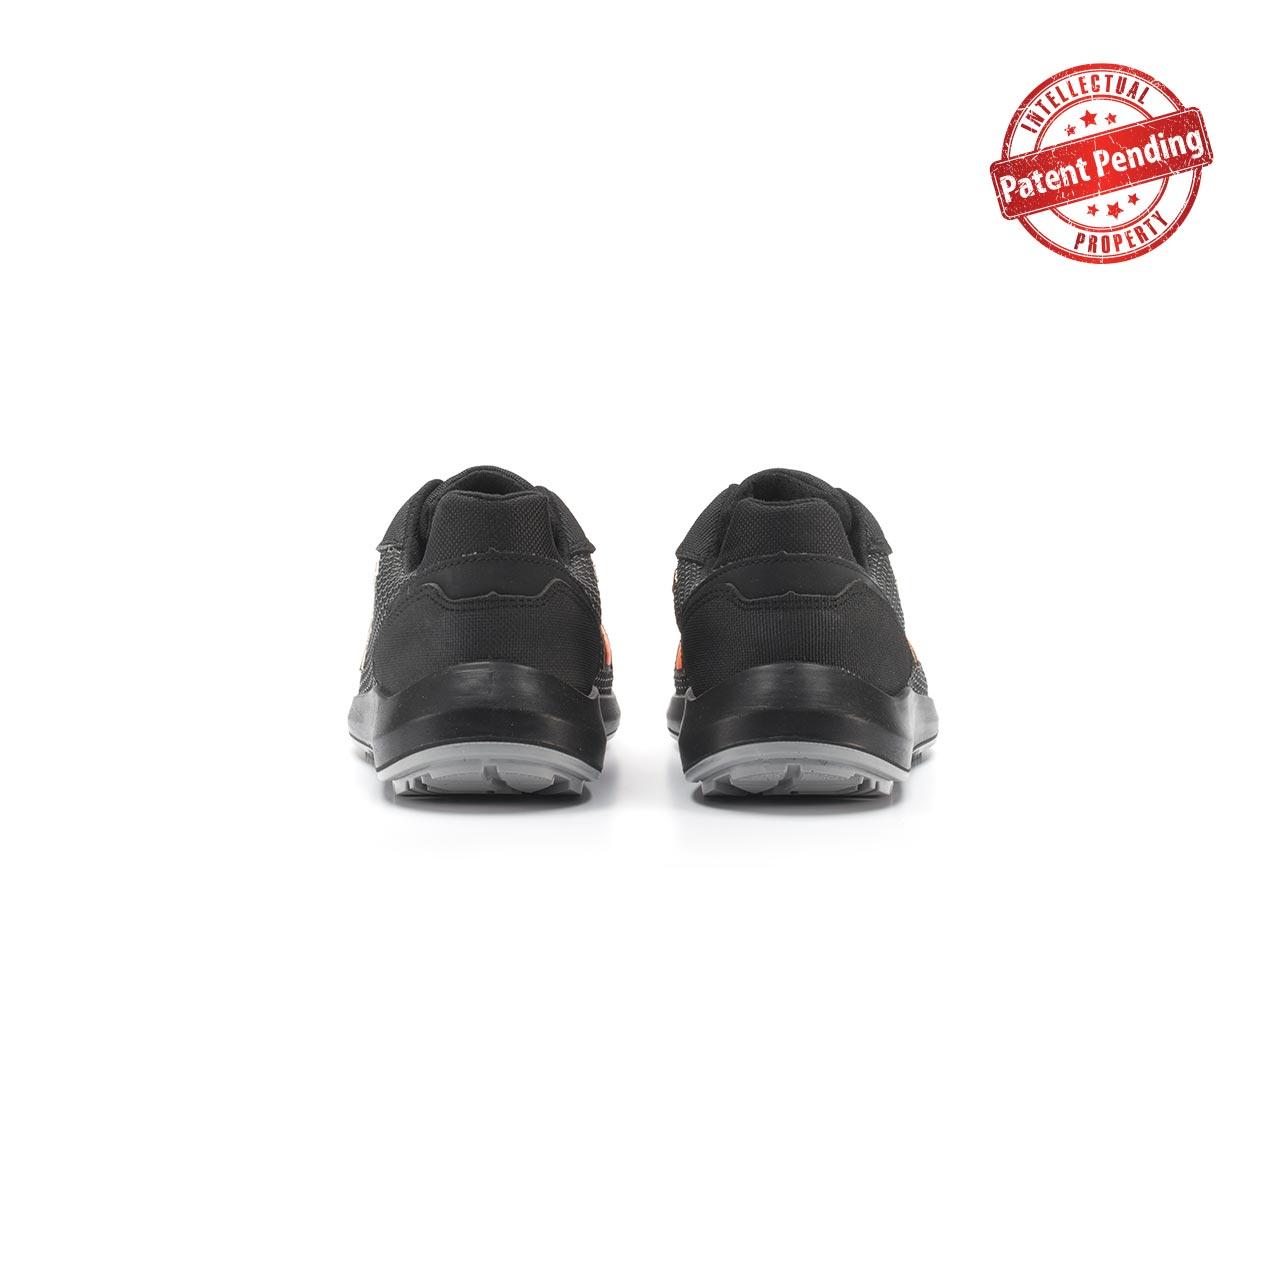 paio di scarpe antinfortunistiche upower modello taurus linea redup vista retro